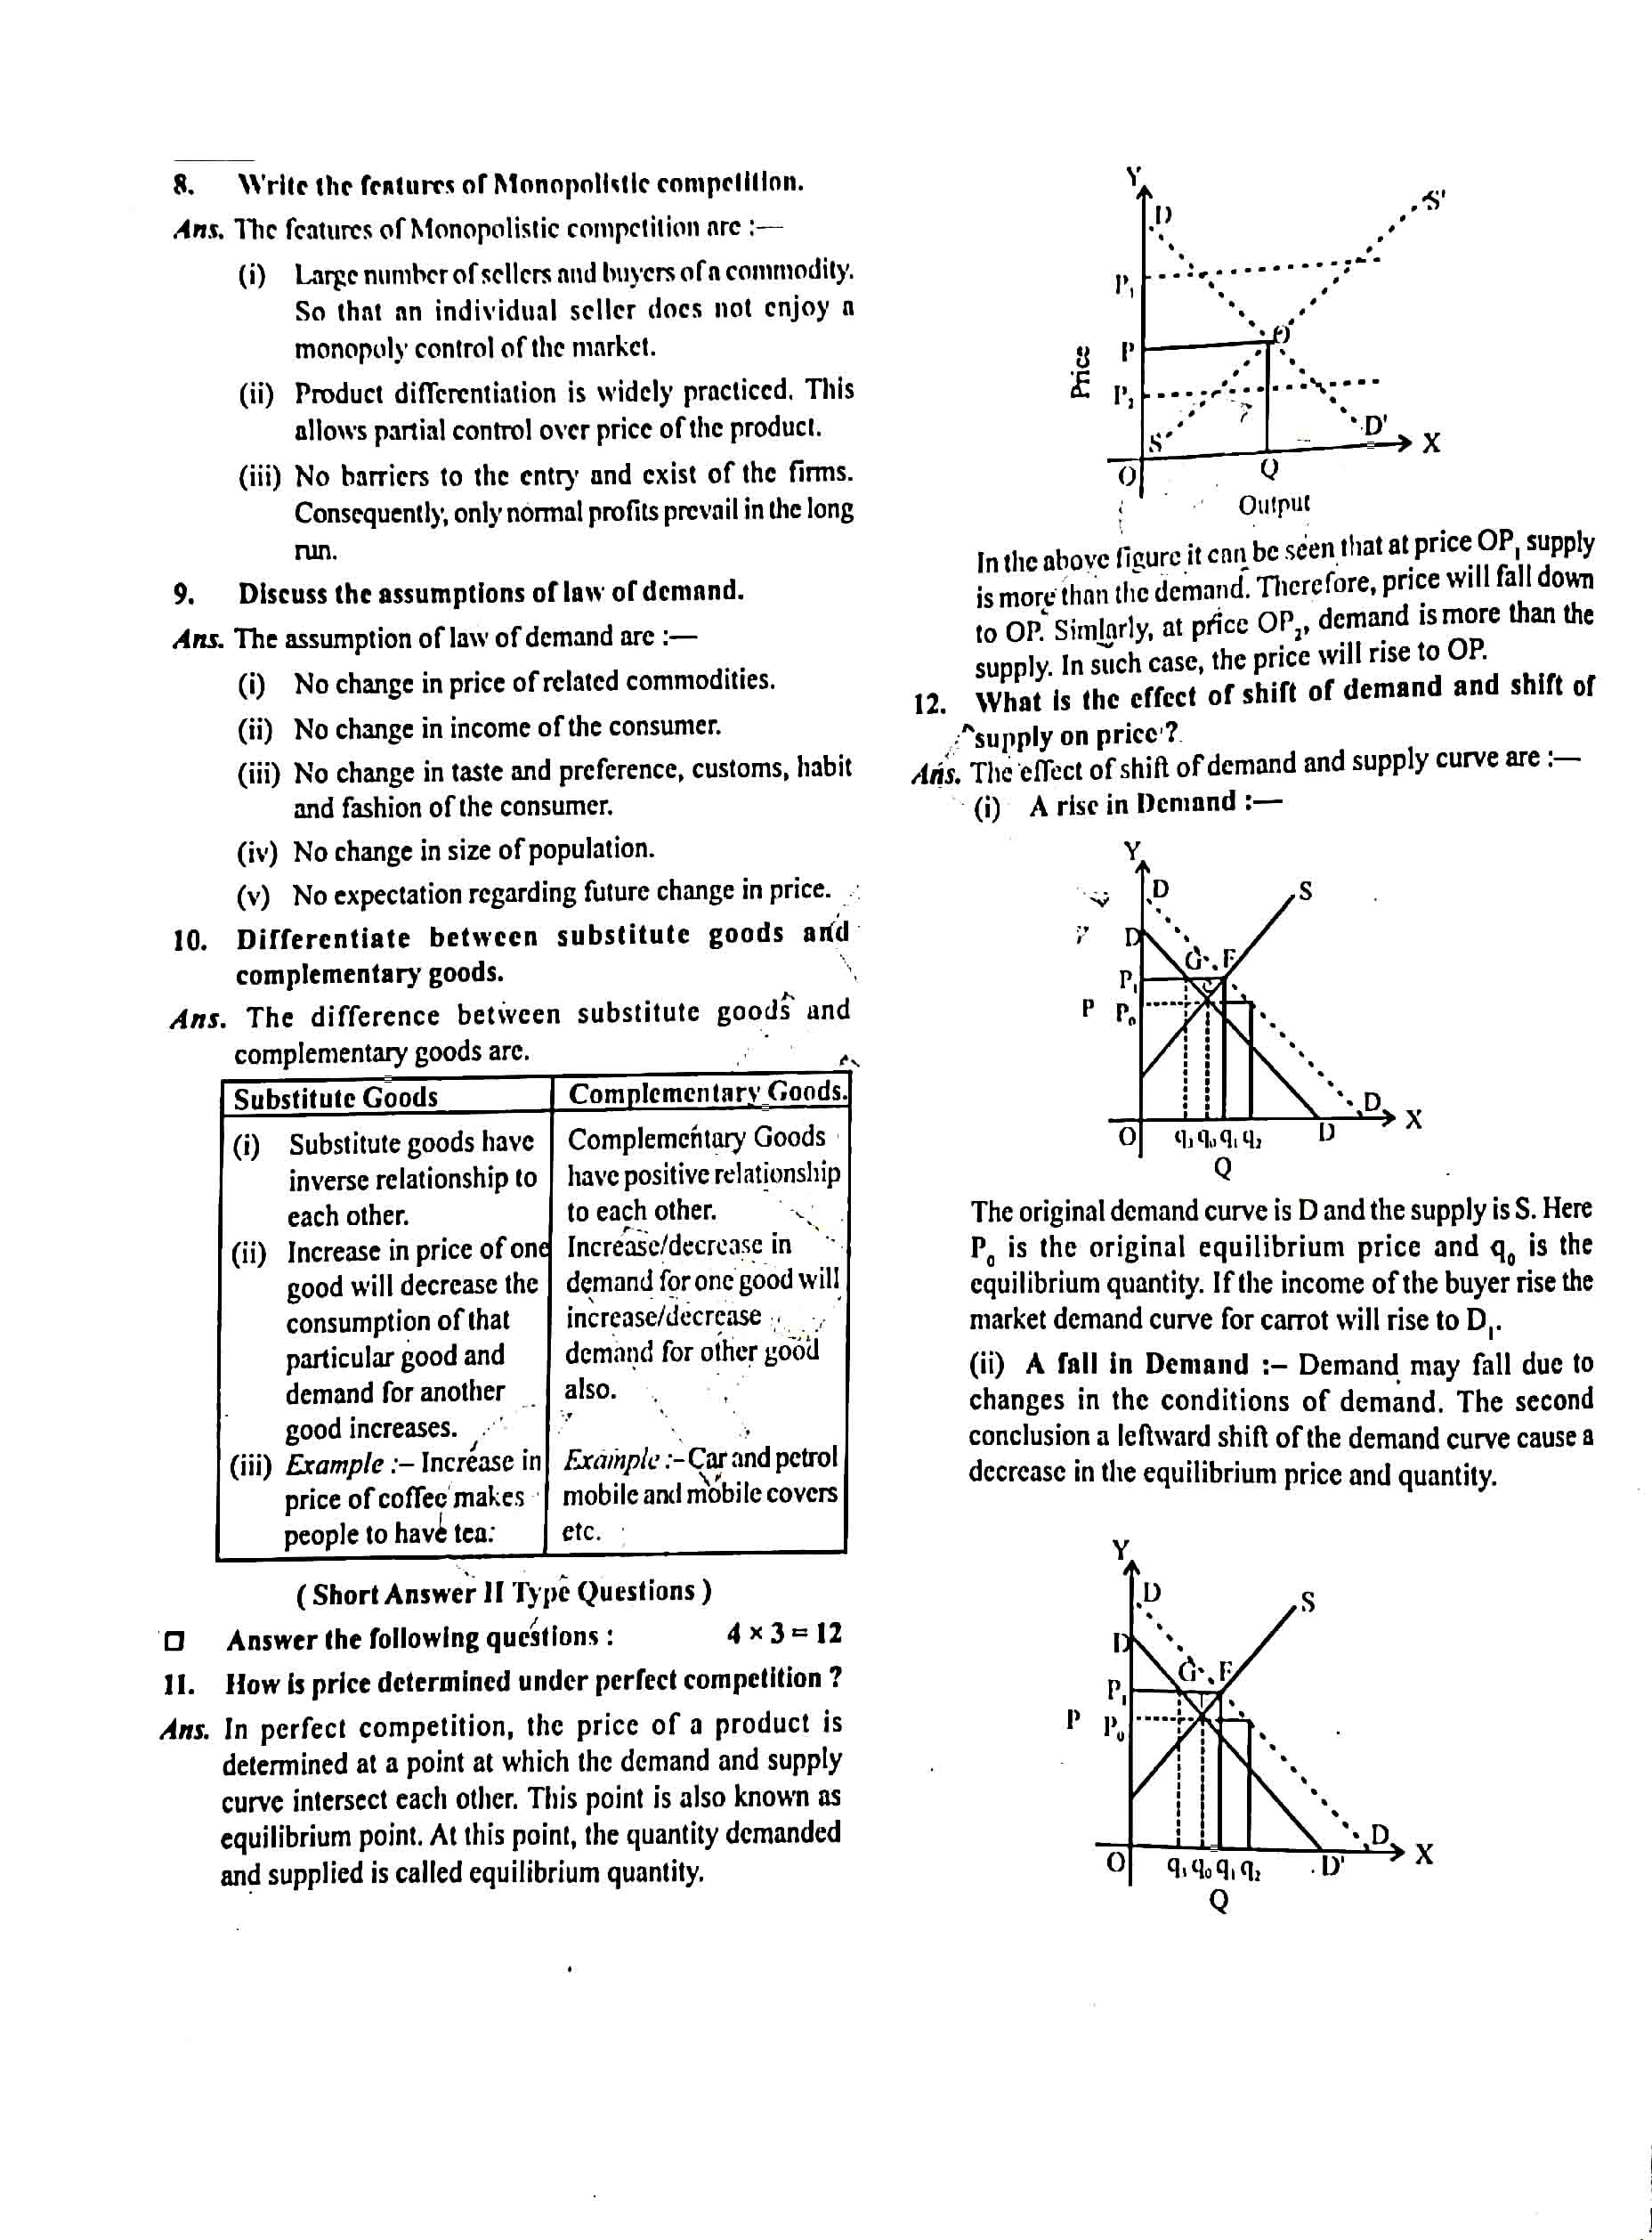 JAC Class 12 economics 2020 Question Paper 02